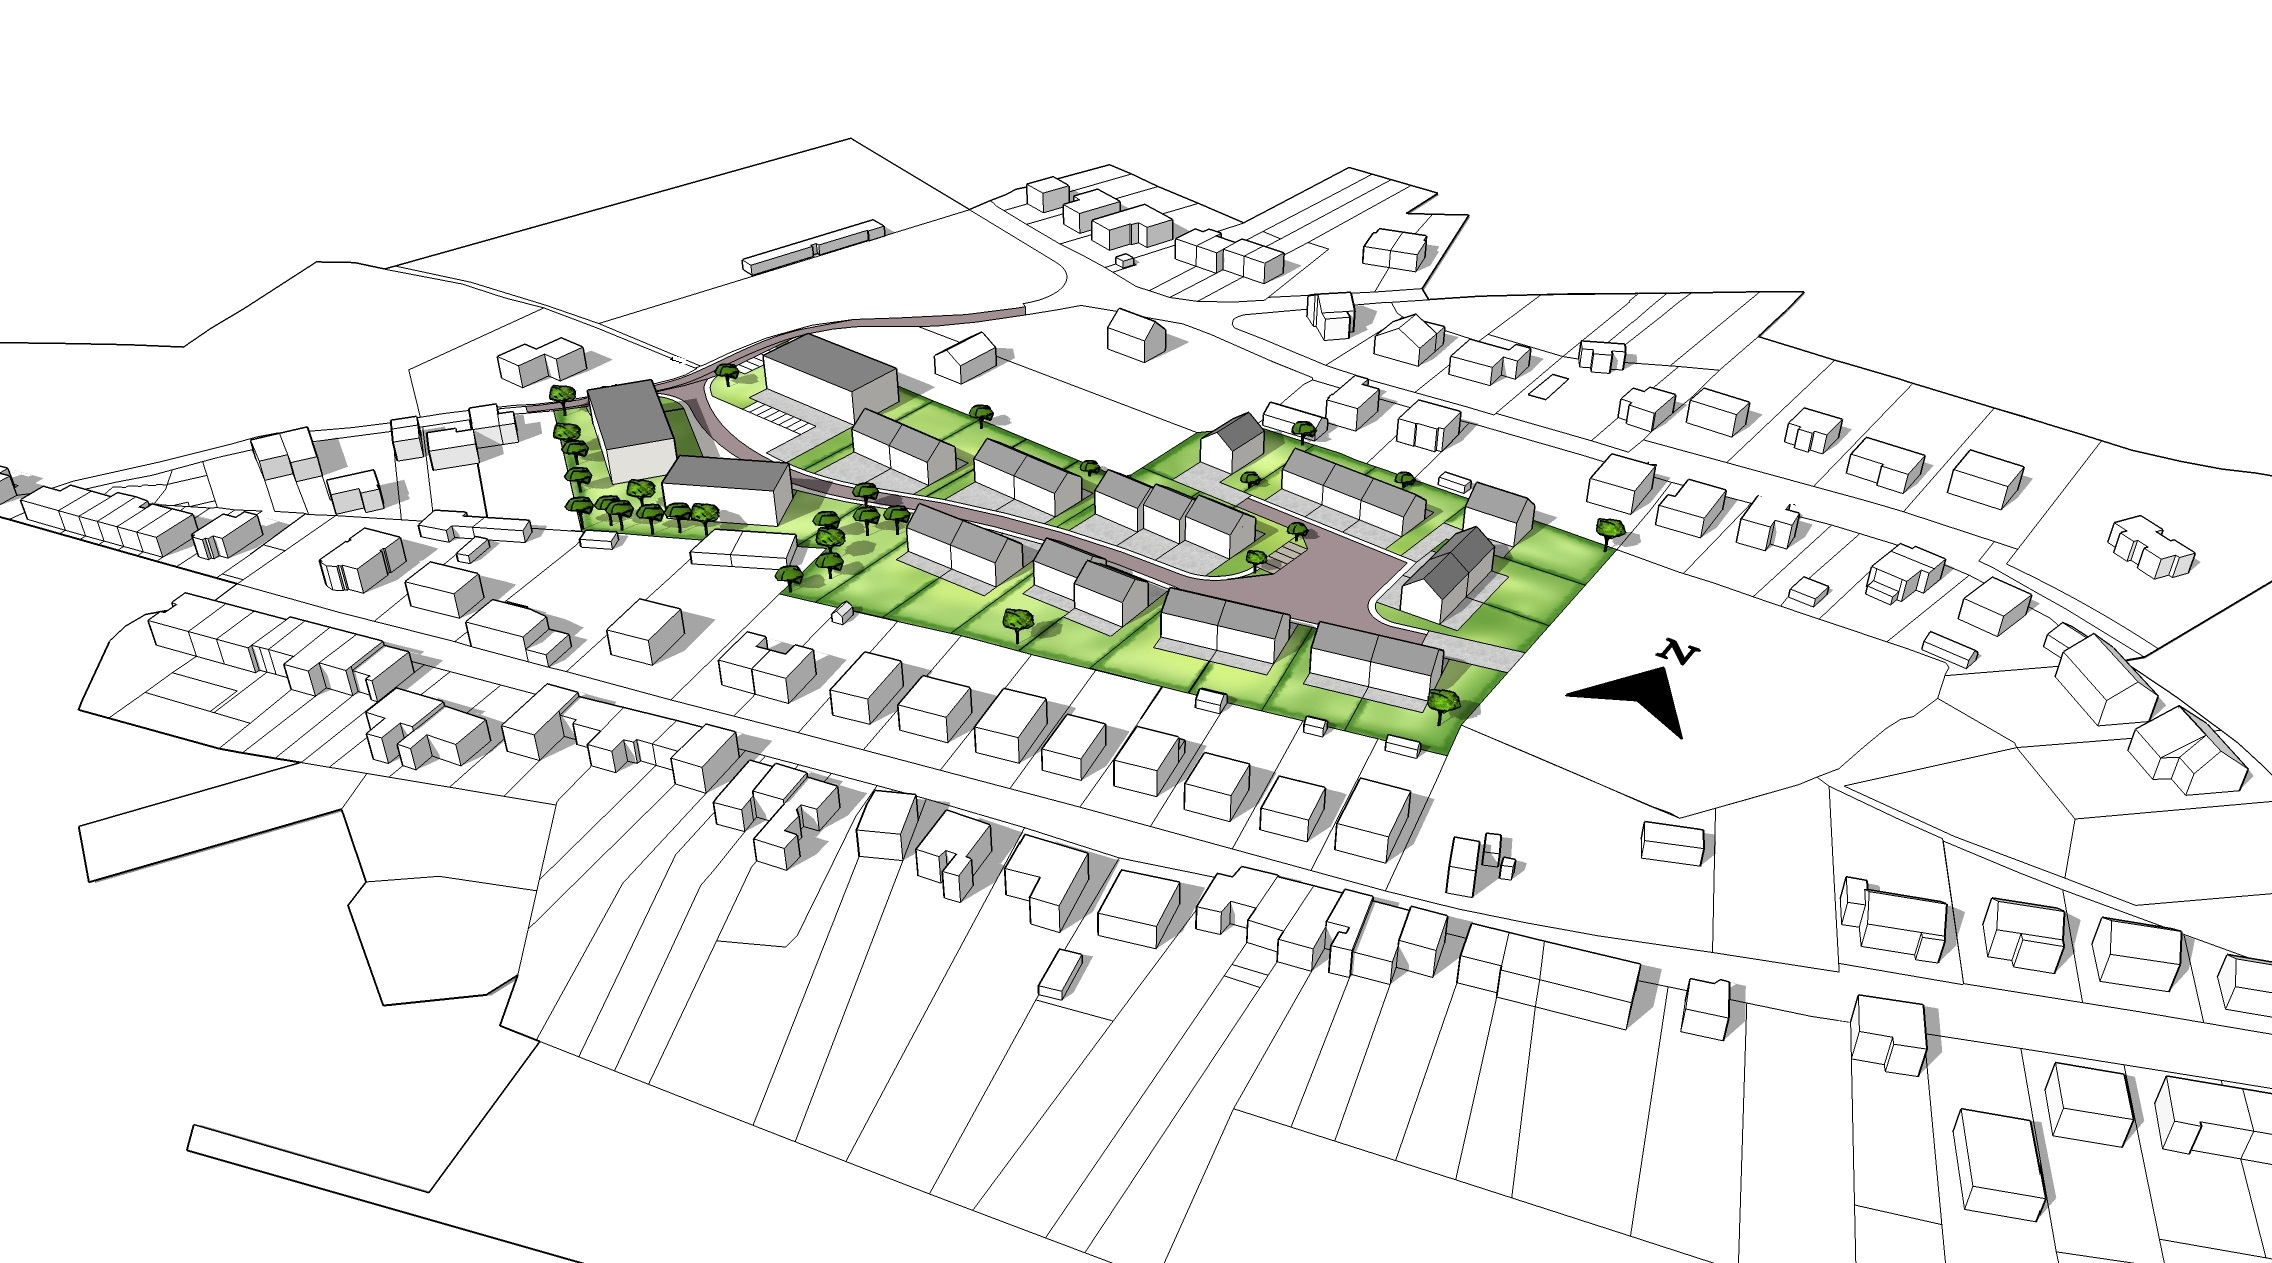 Plan 3D d'un projet d'urbanisation